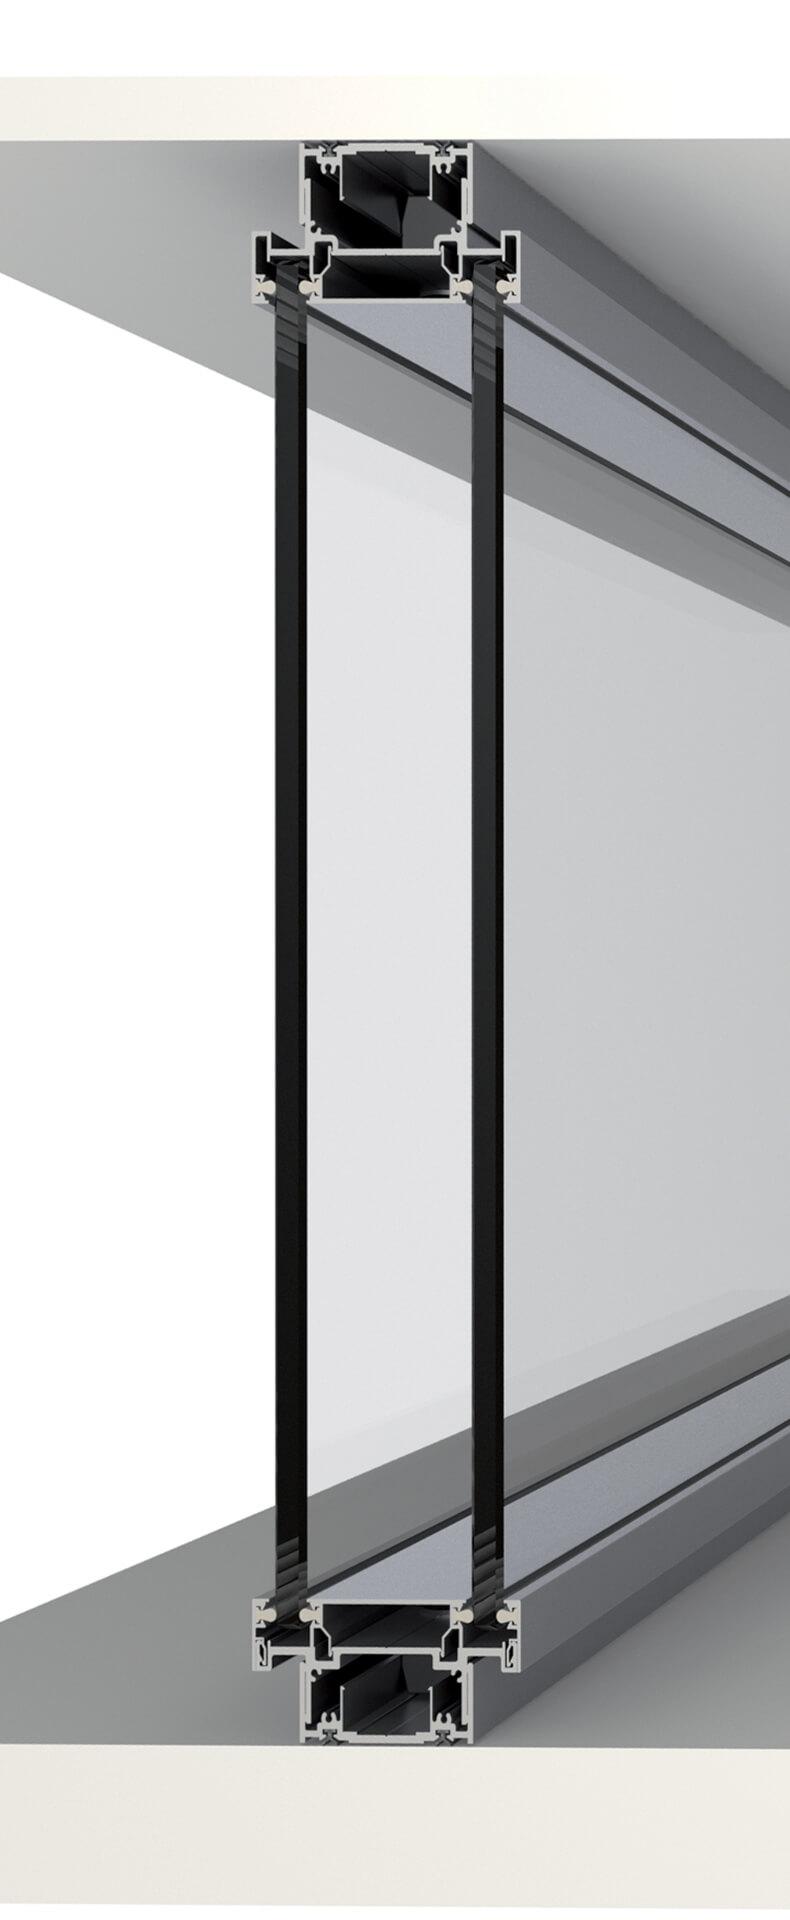 pareti divisorie in legno e vetro - doppio vetro